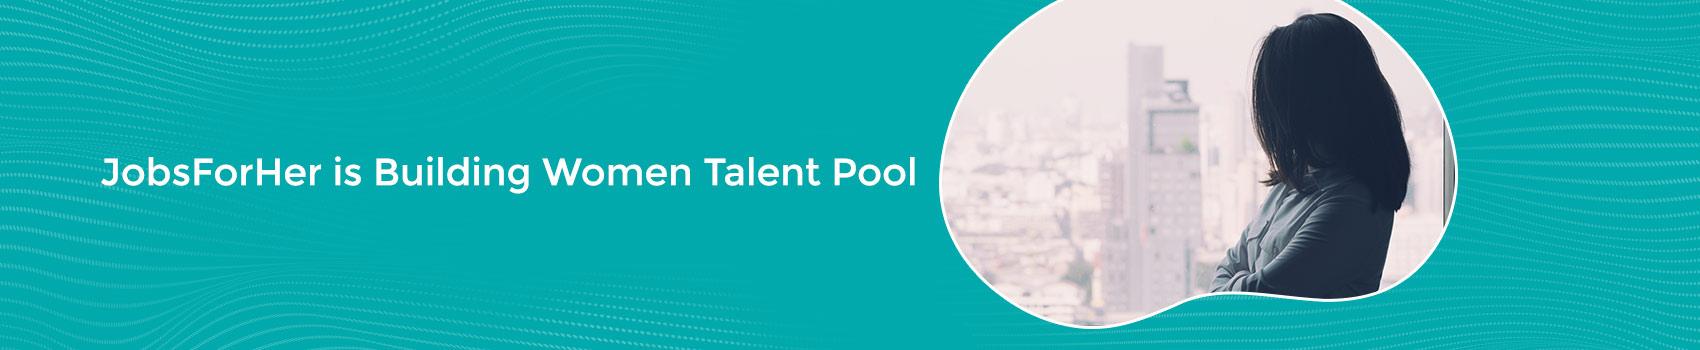 JobsForHer is Building Women Talent Pool